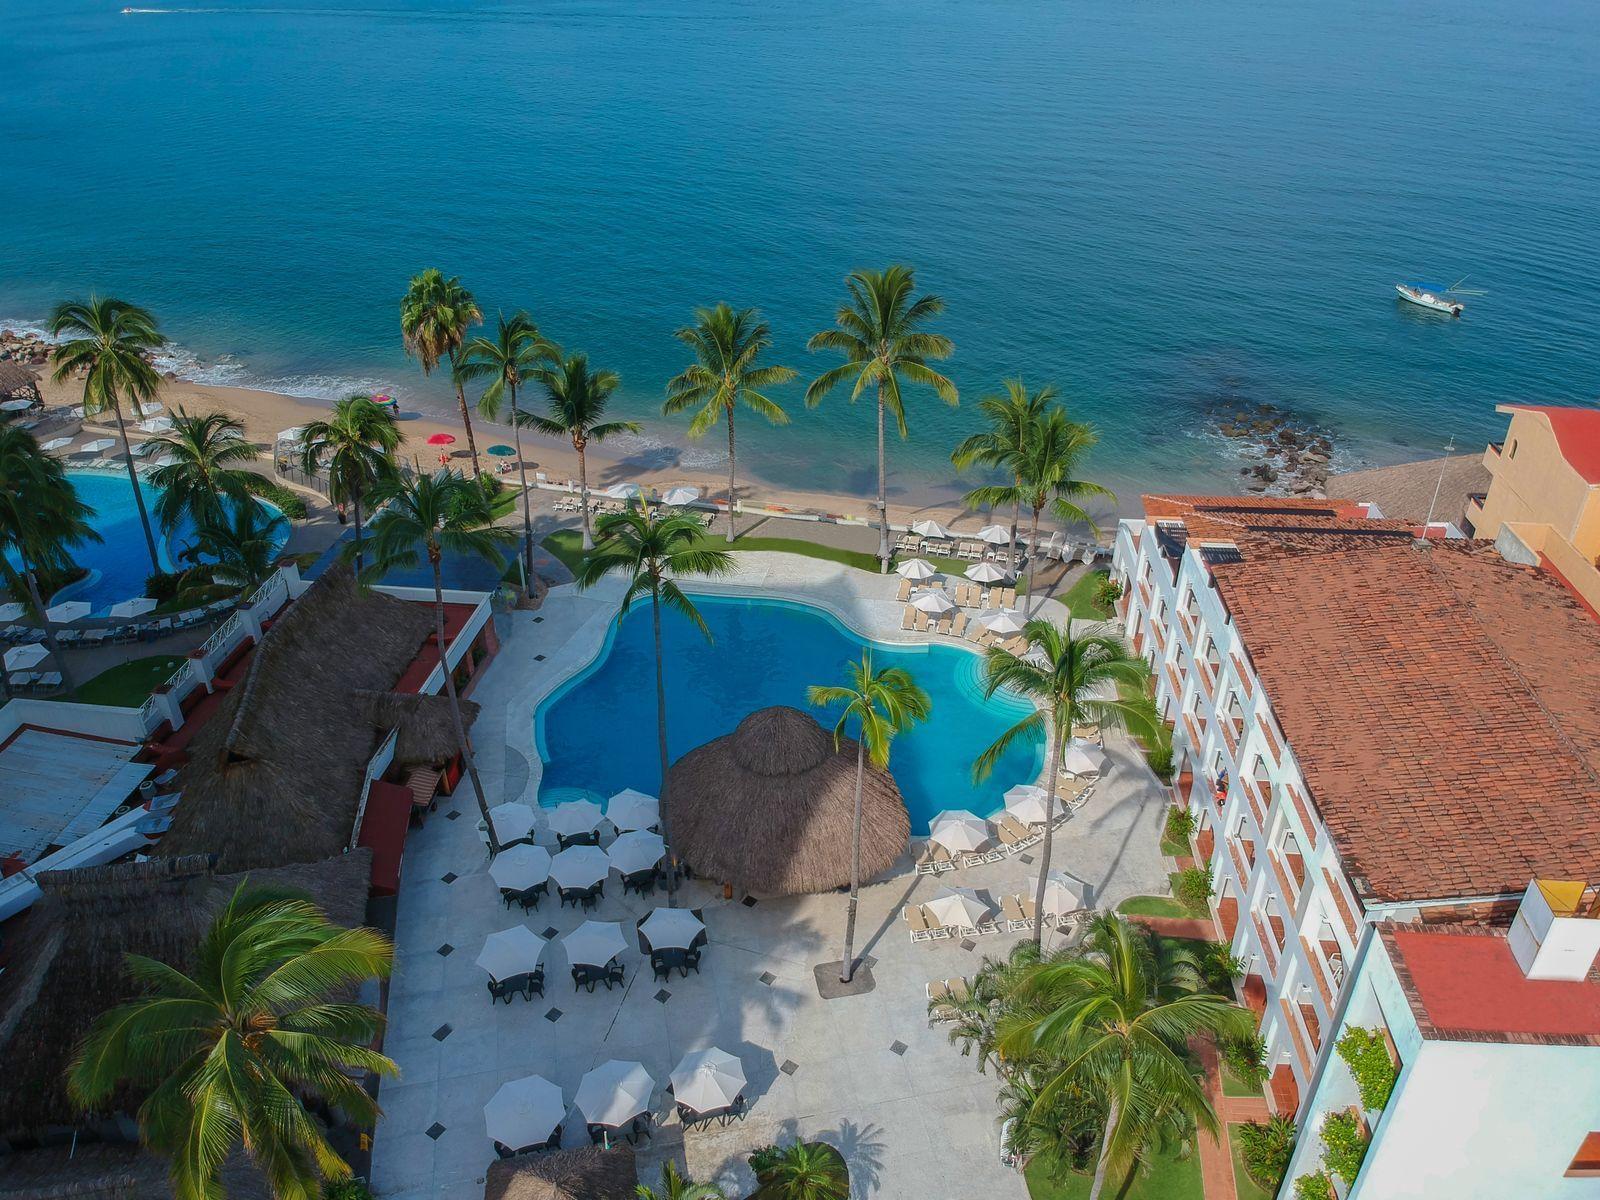 Pool Arial at Plaza Pelicanos Club Beach Resort